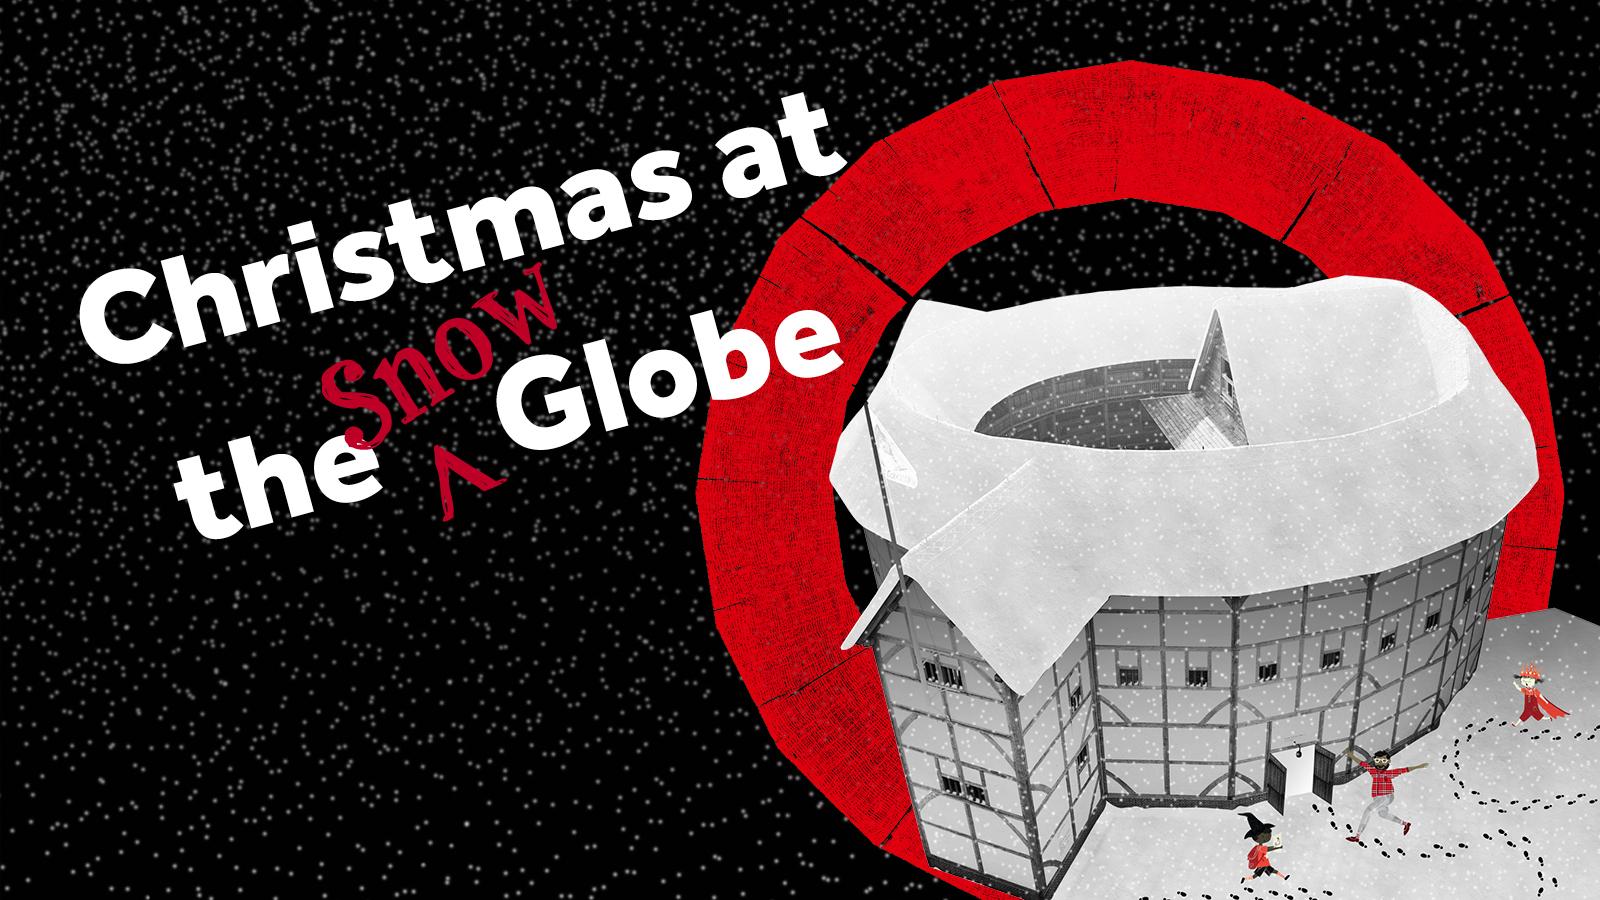 Christmas at the Snow Globe, 2019